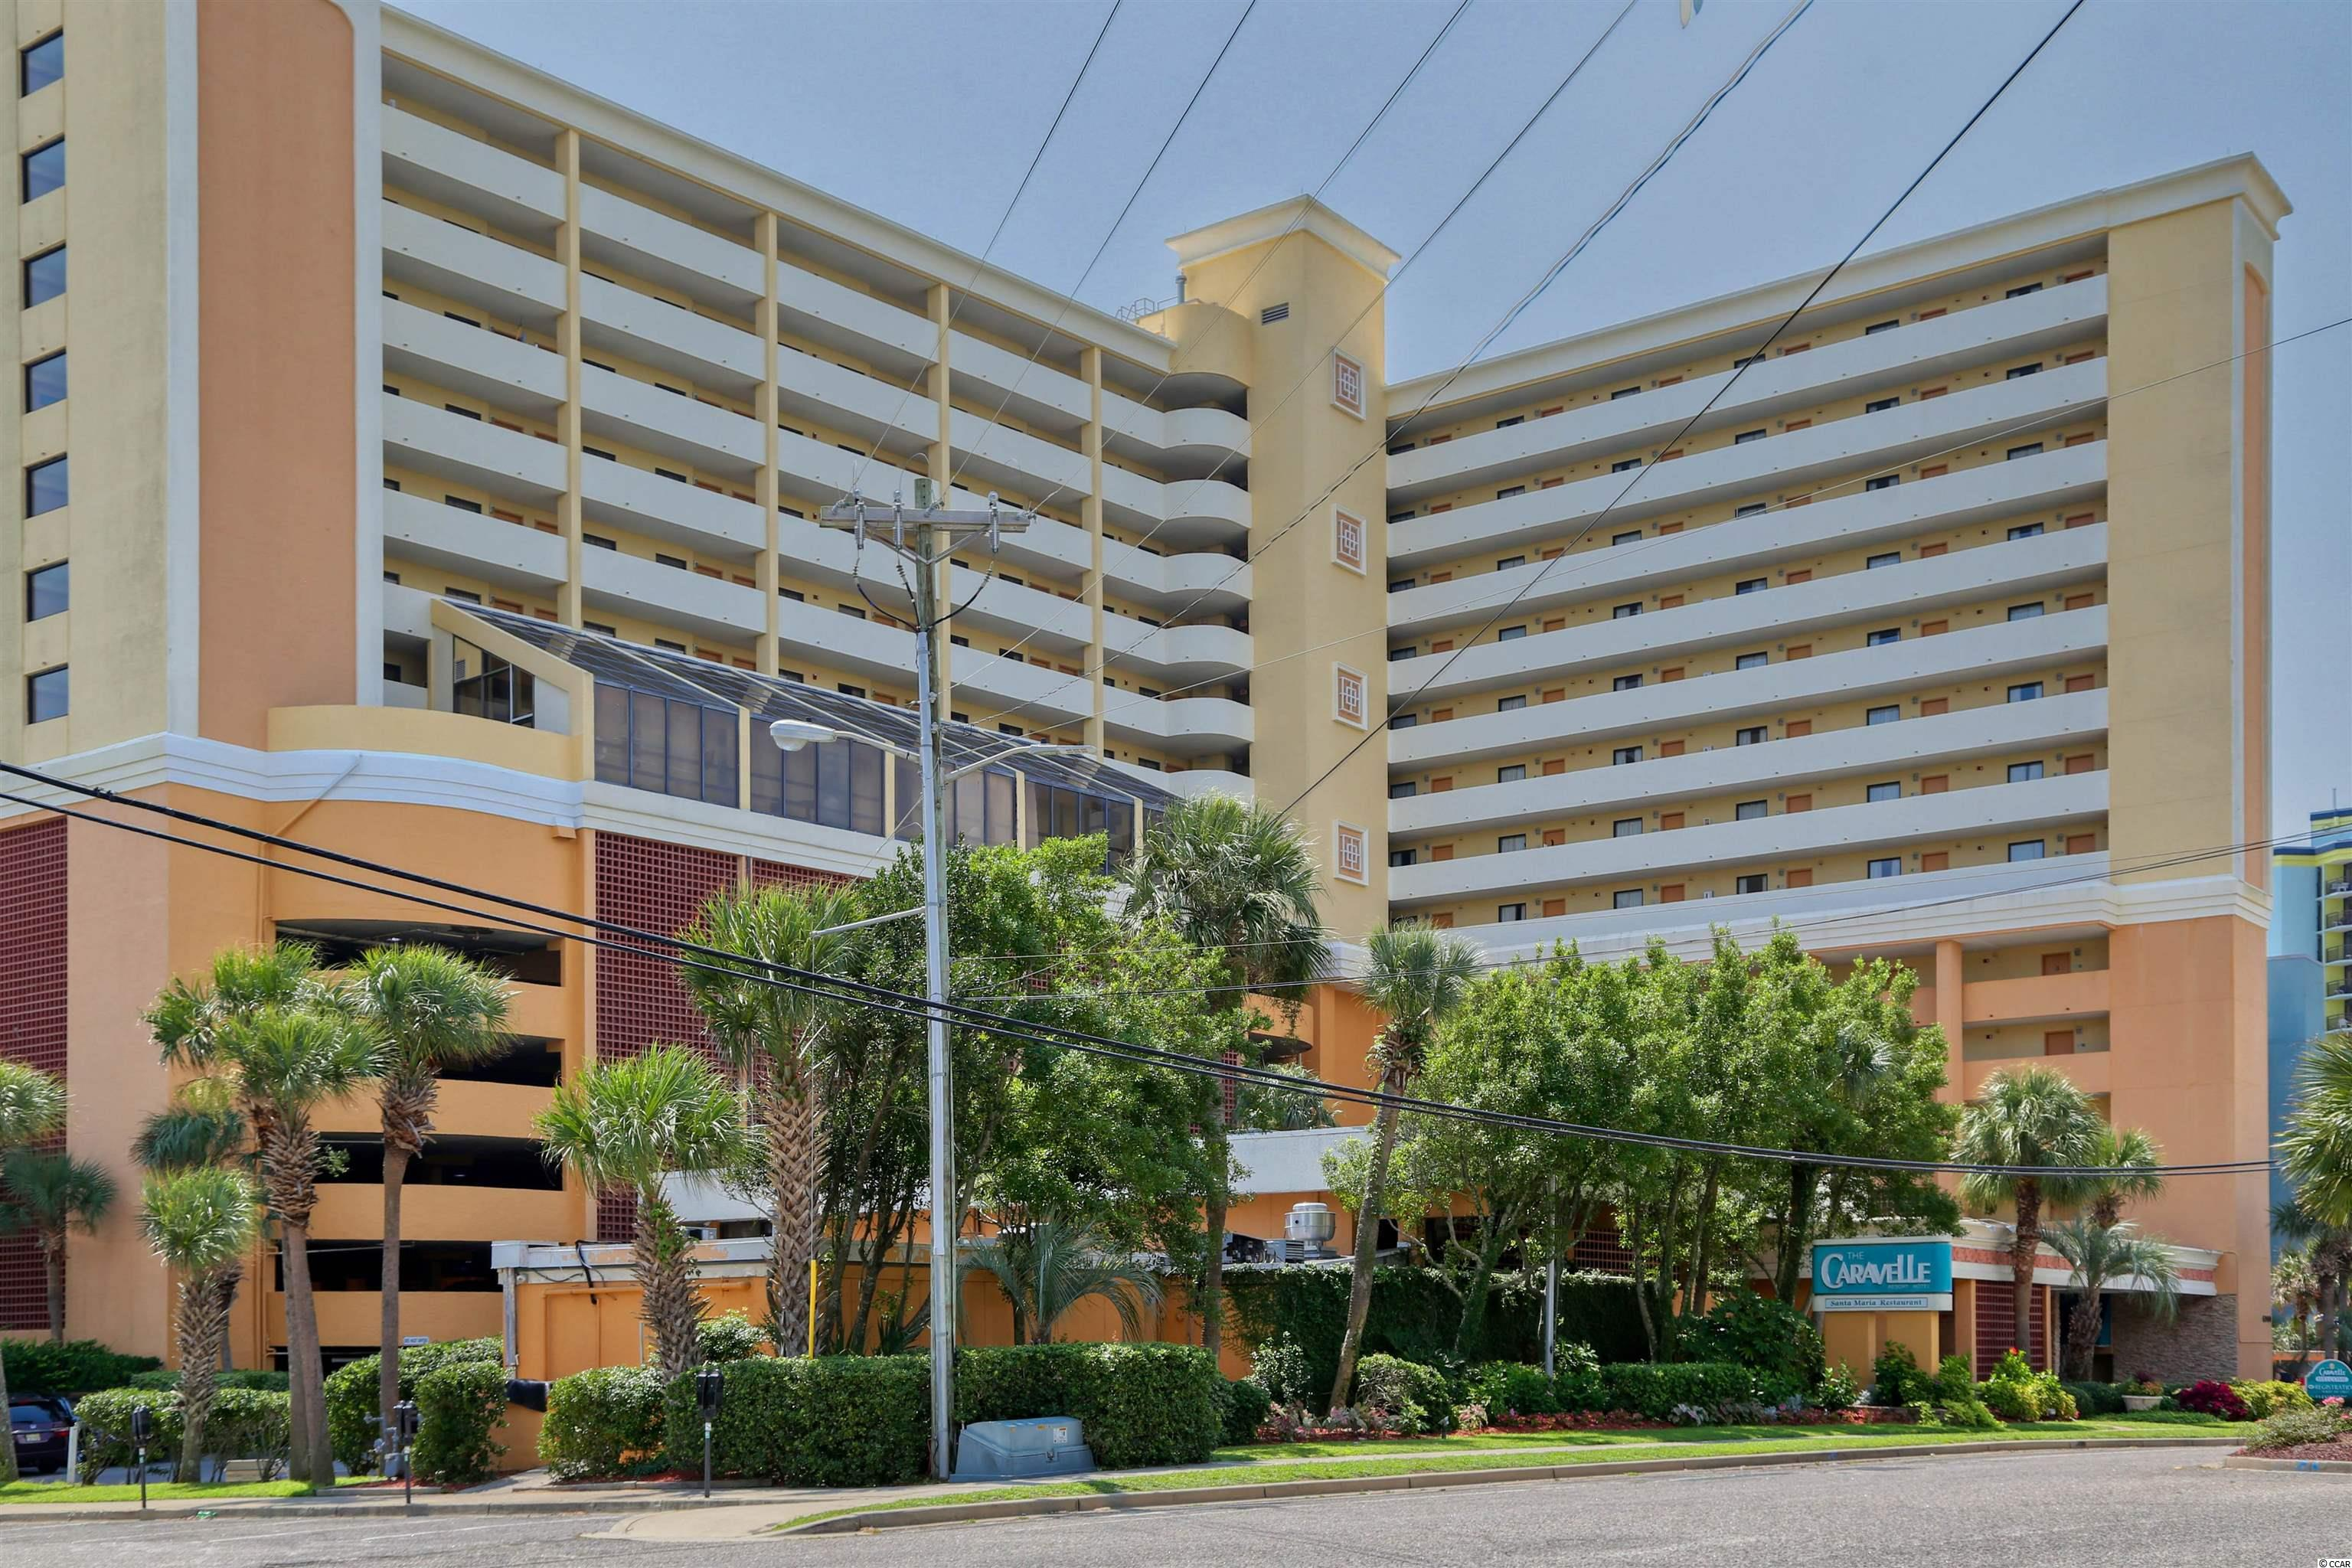 Caravelle Resort Real Estate Listings Main Image